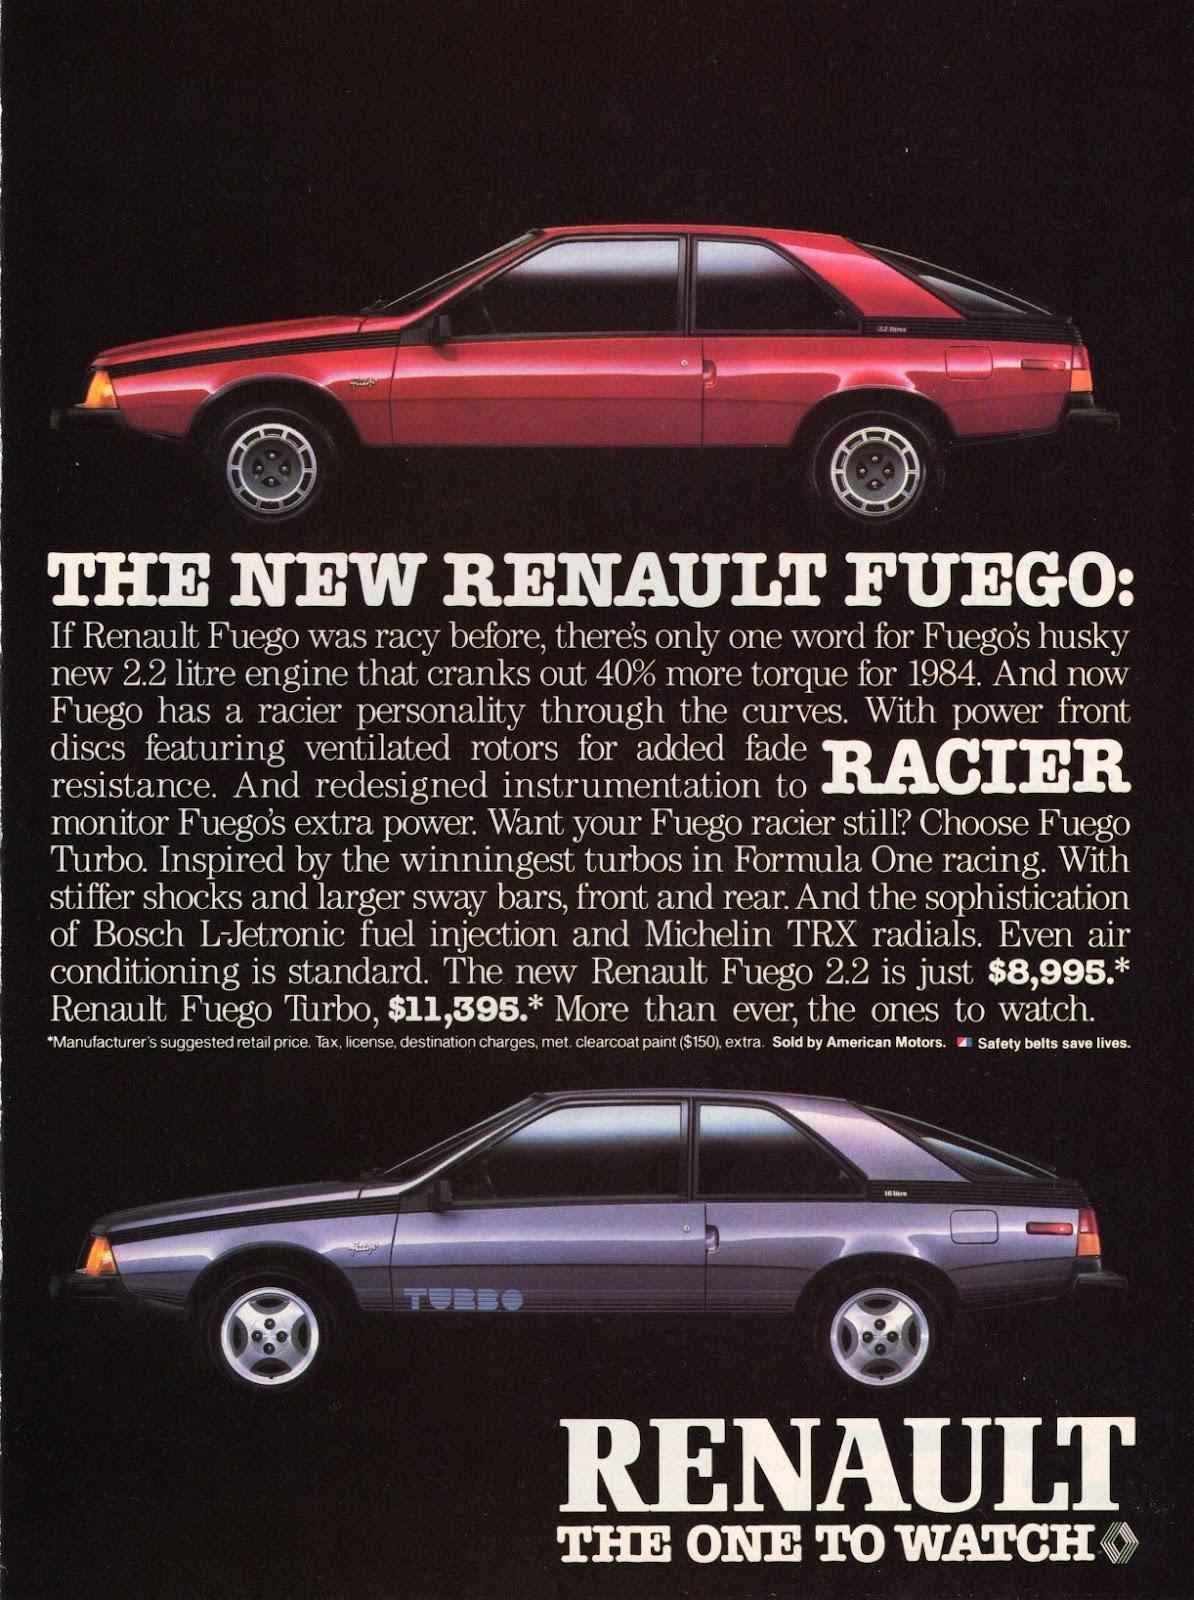 1984-Renault-Fuego-2.2-and-Fuego-Turbo.jpg